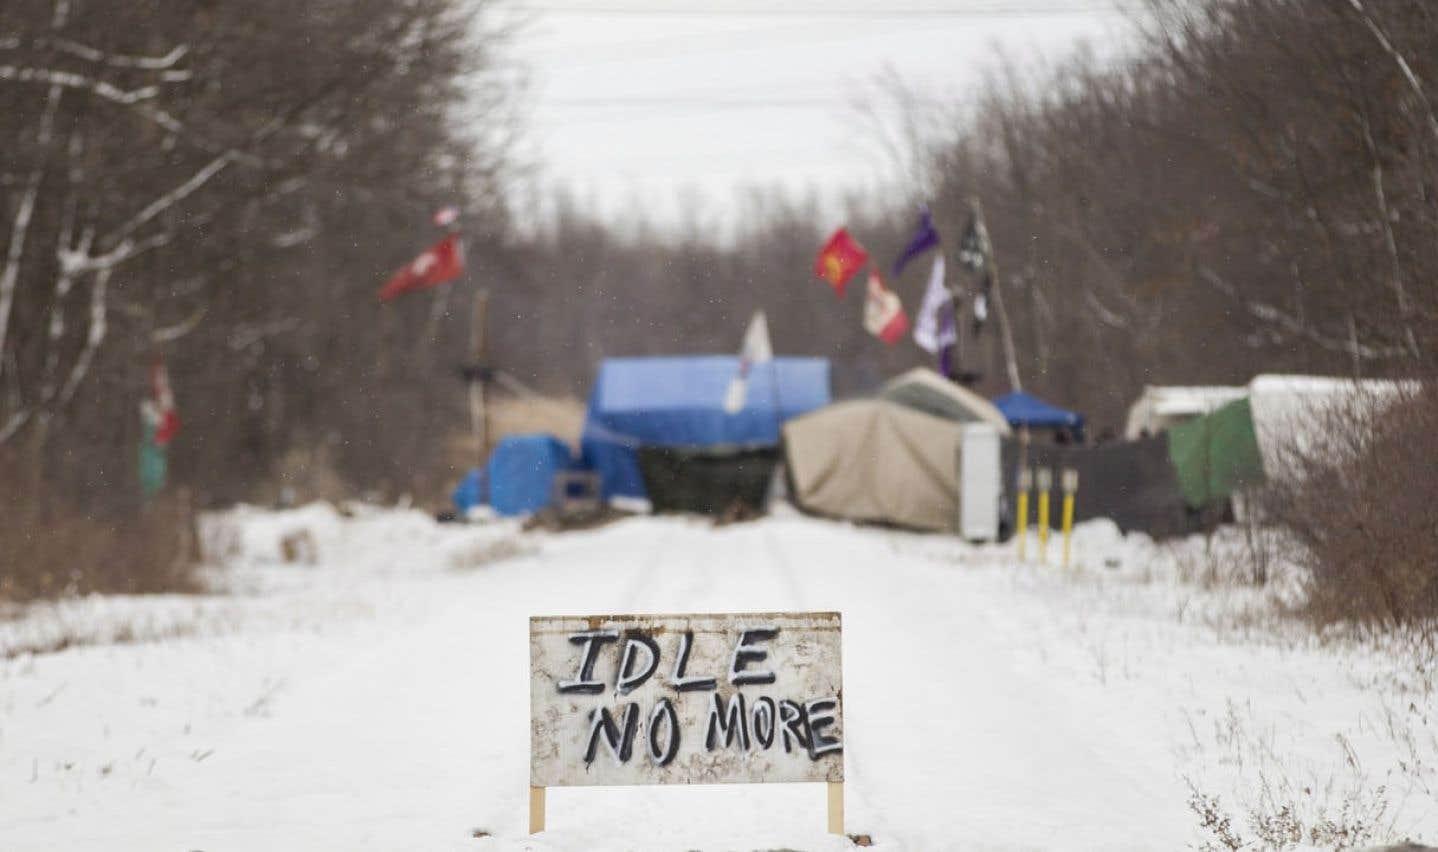 Idle No More grandira en 2013, prédit un chef